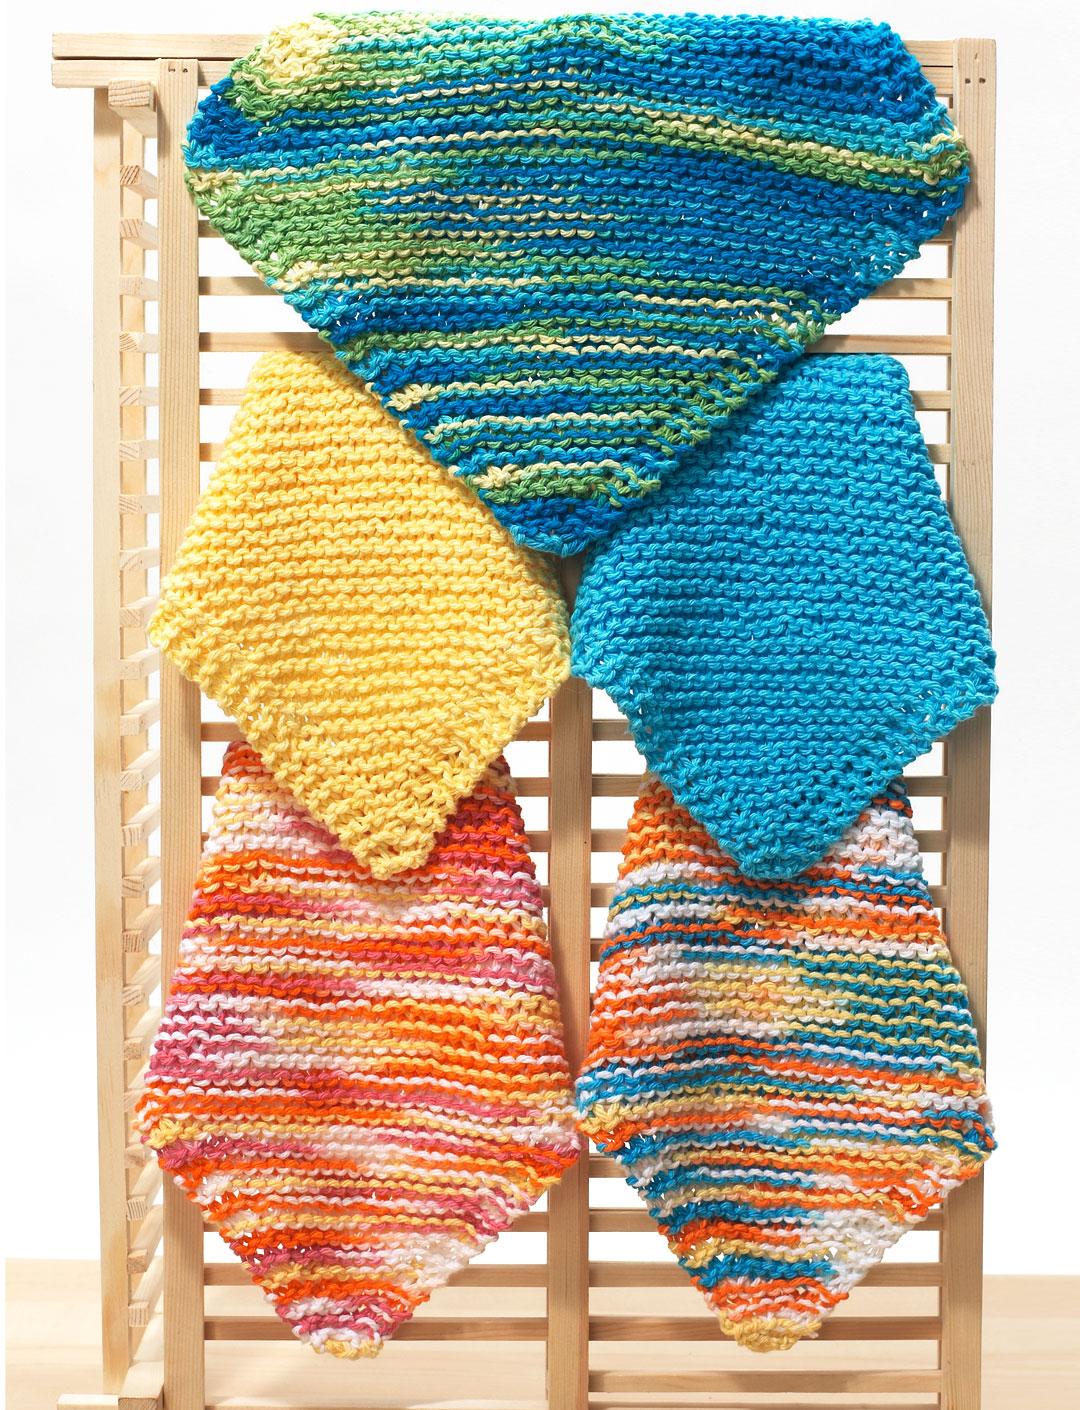 Easy Dishcloth Knitting Pattern via FaveCrafts